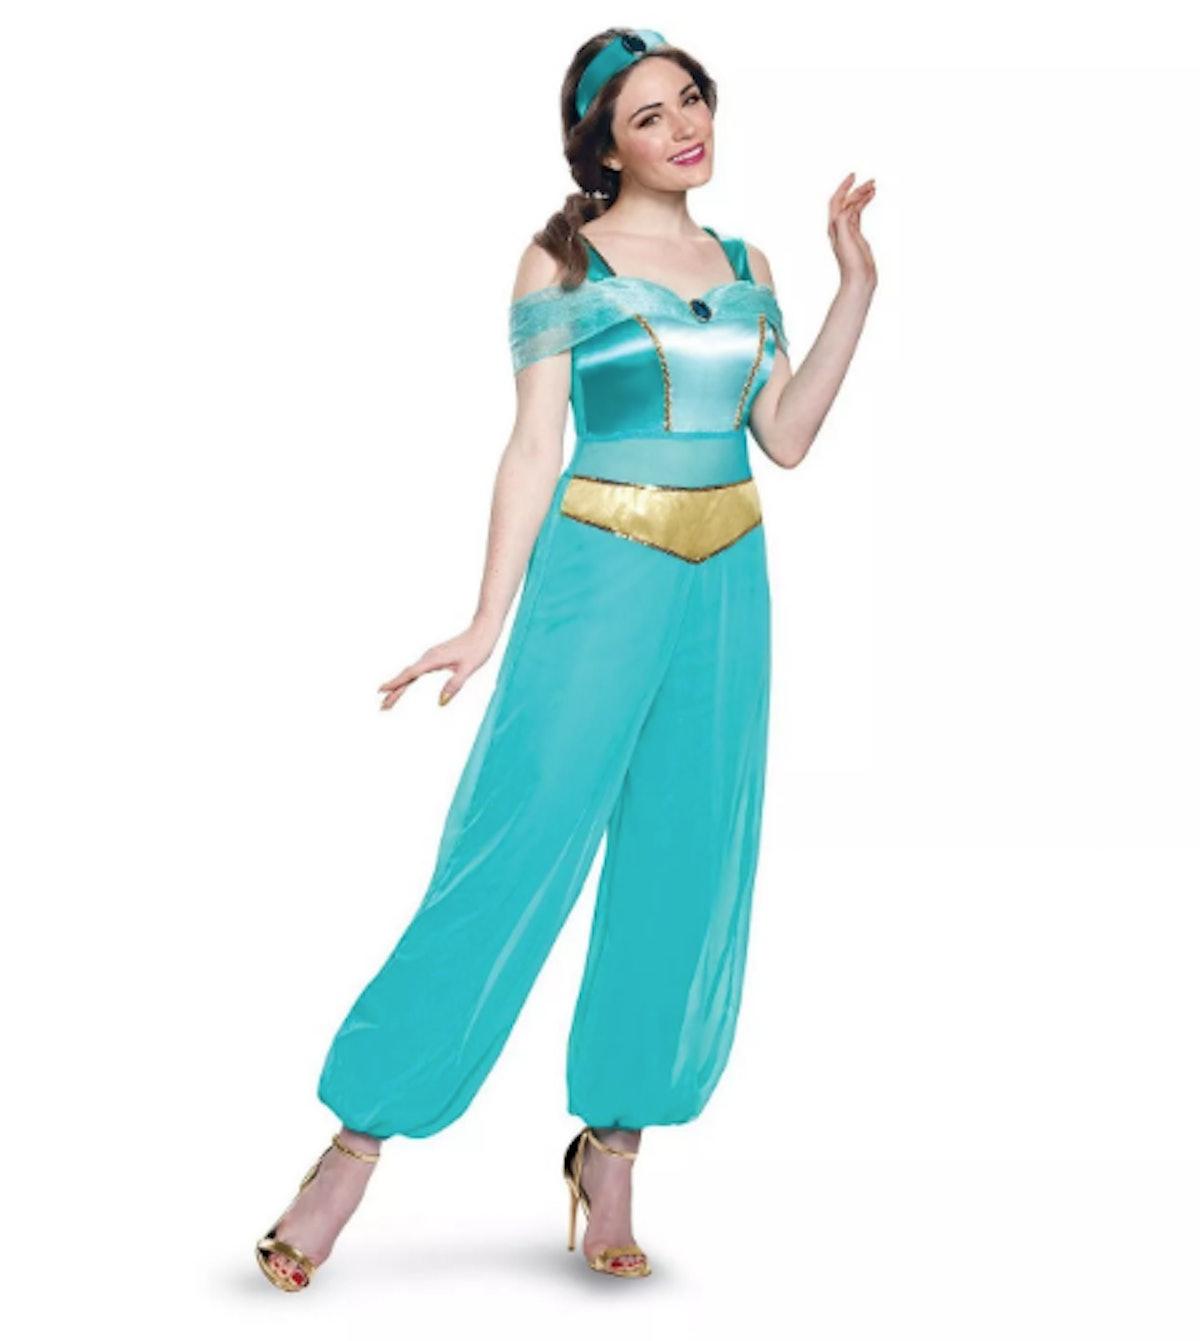 Women's Aladdin Disney Princess Jasmine Deluxe Adult Costume